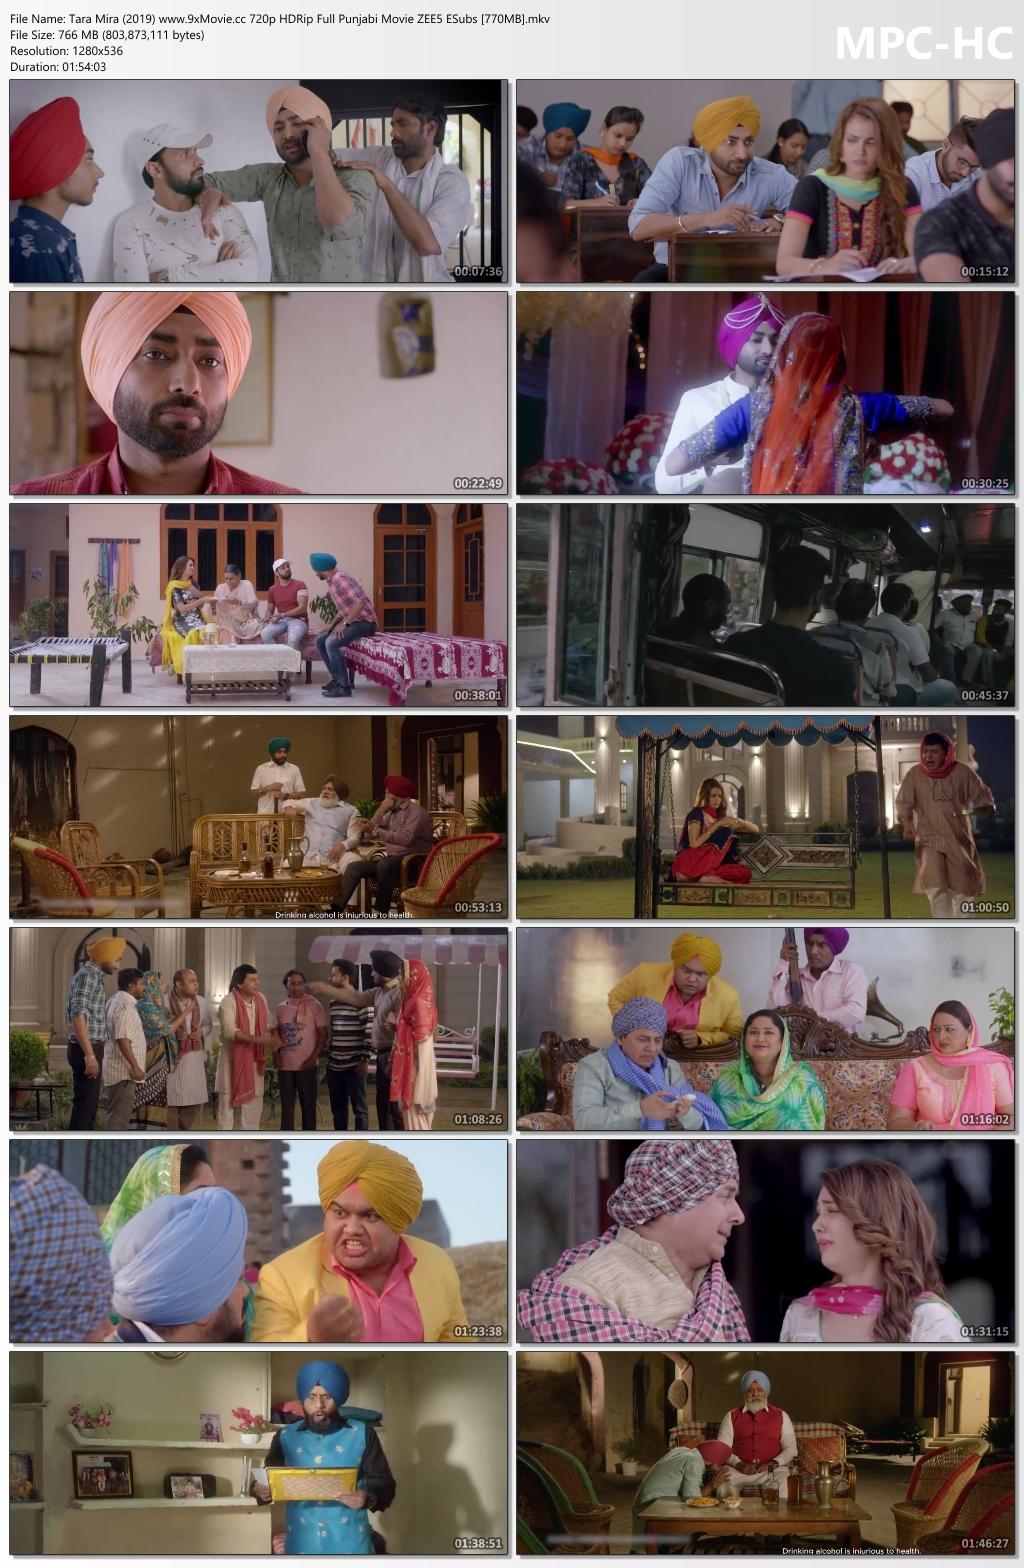 Tara-Mira-2019-www-9x-Movie-cc-720p-HDRip-Full-Punjabi-Movie-ZEE5-ESubs-770-MB-mkv